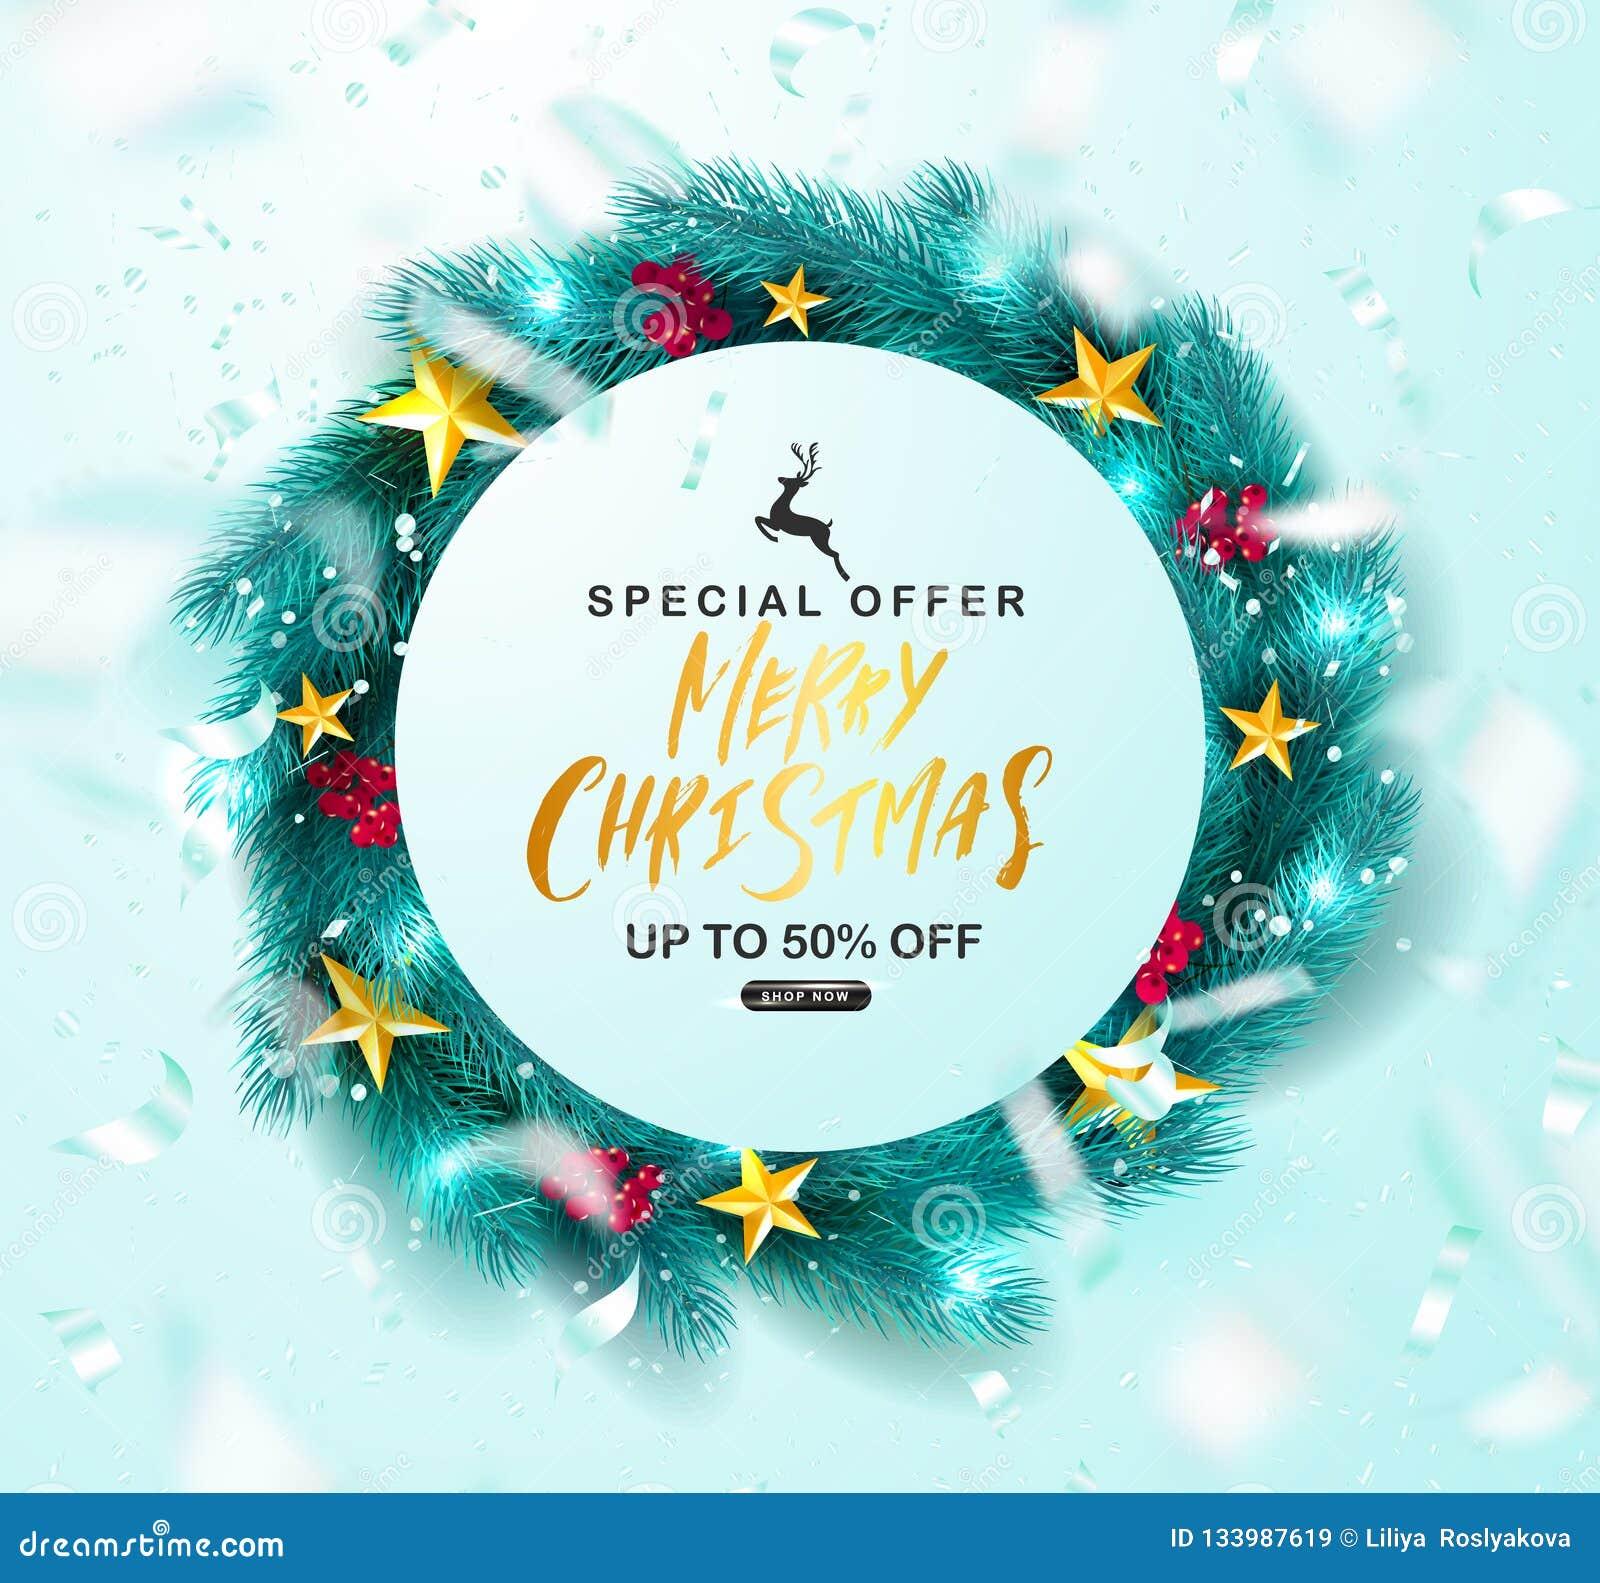 Merry Christmas Sale Poster Green Christmas Wreath With Rowan Golden